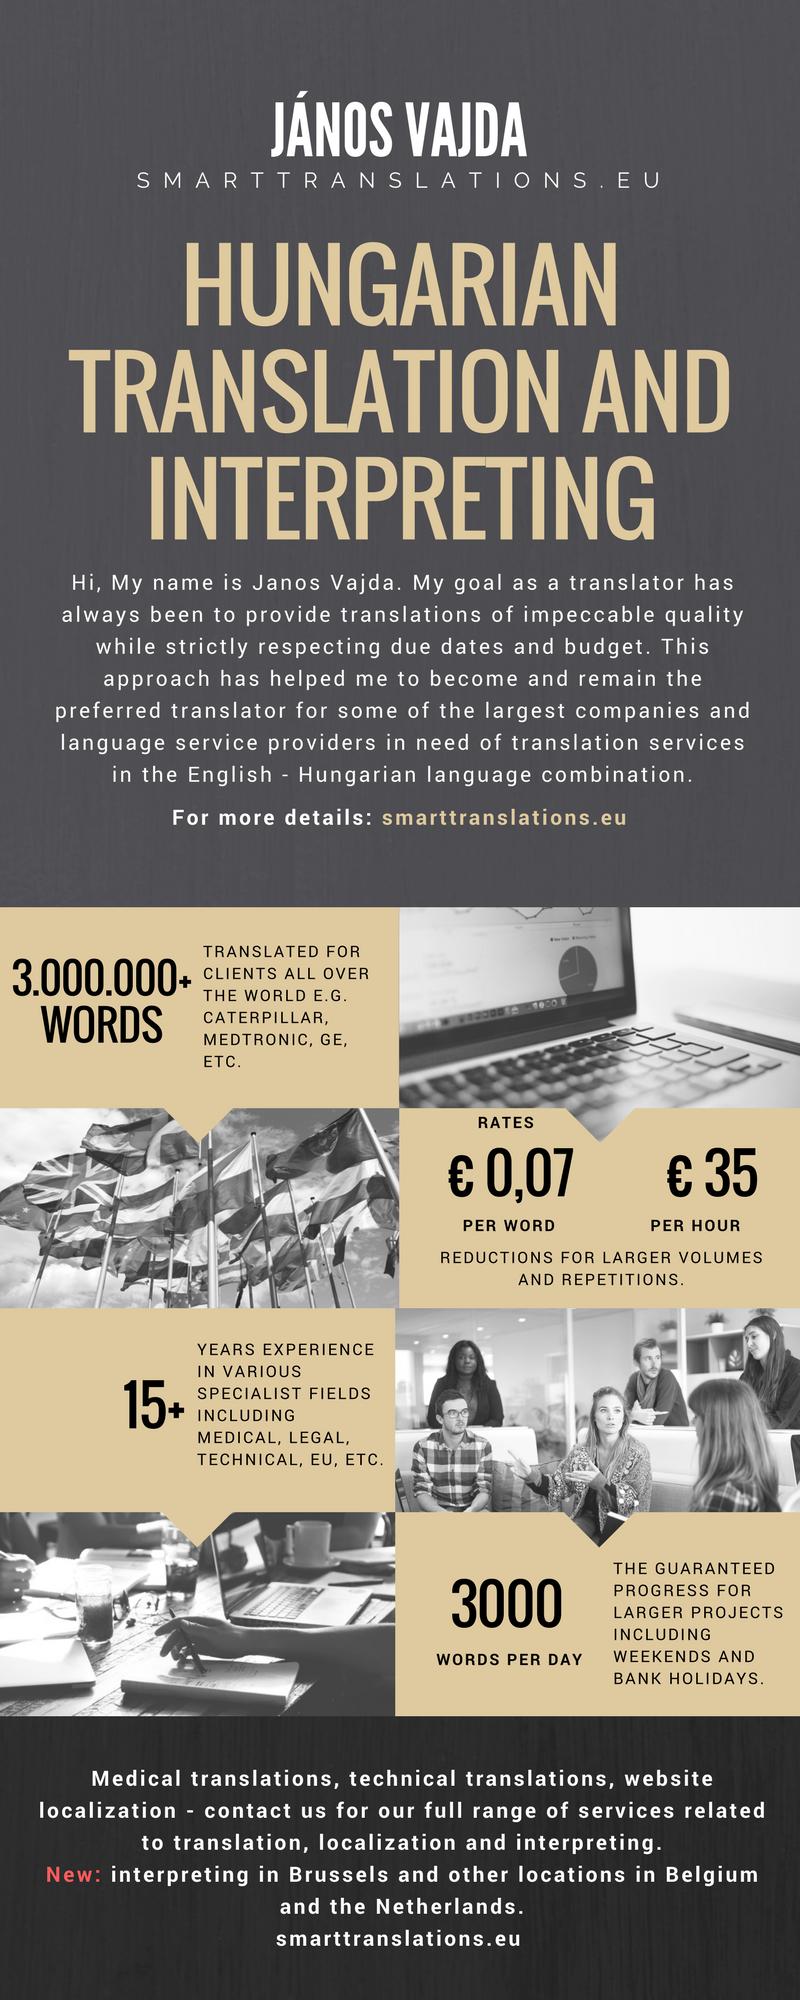 SmartTranslations info graphic